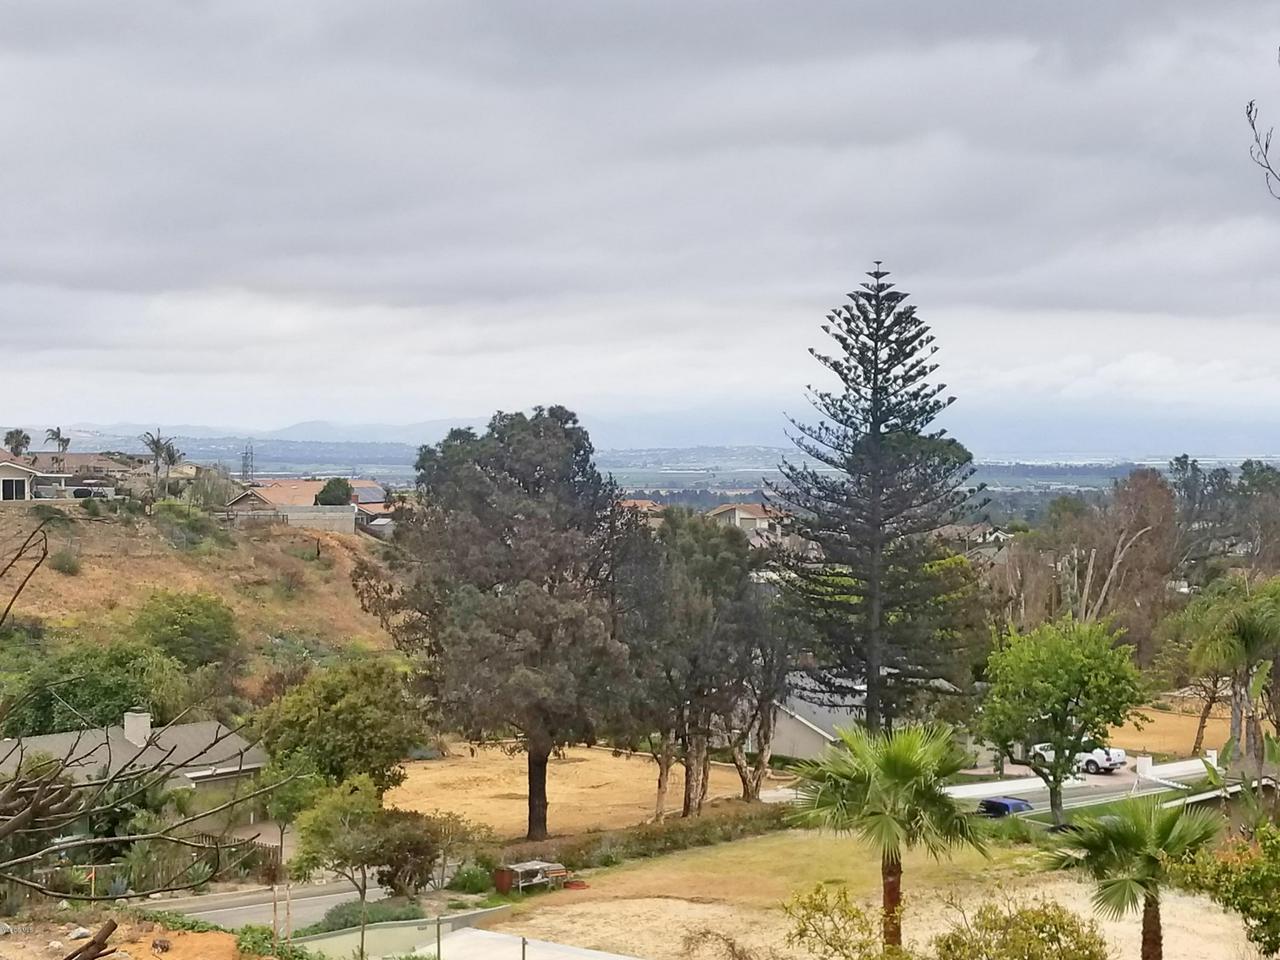 792 VIA ONDULANDO, Ventura, CA 93003 - vIa ondulando photo 1